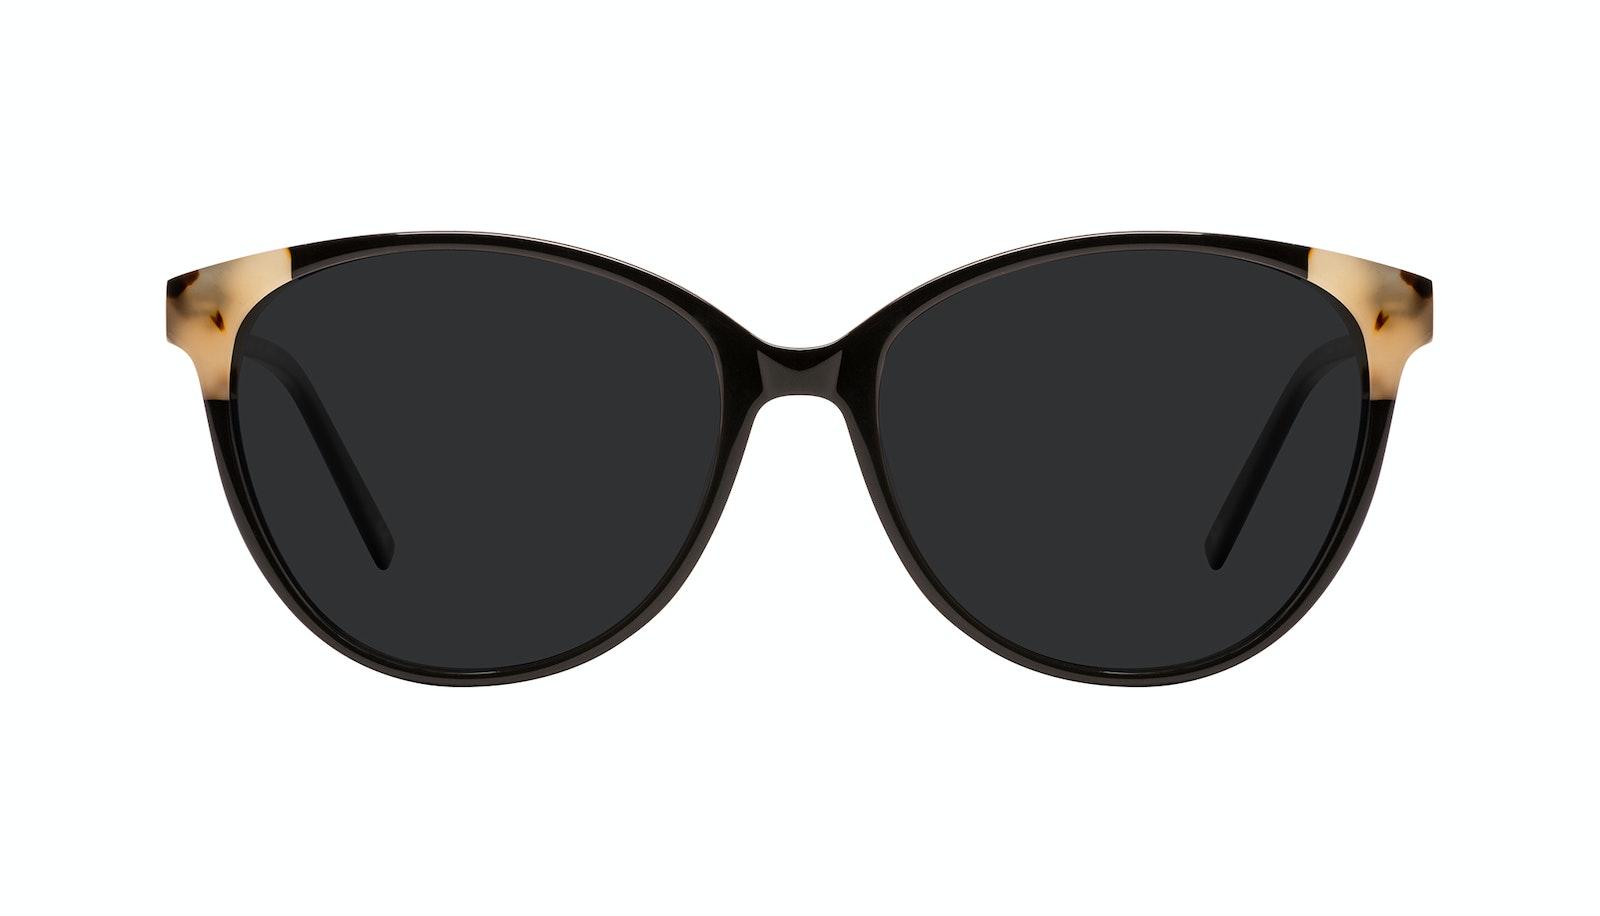 Affordable Fashion Glasses Round Sunglasses Women Imagine II Plus Ebony Granite